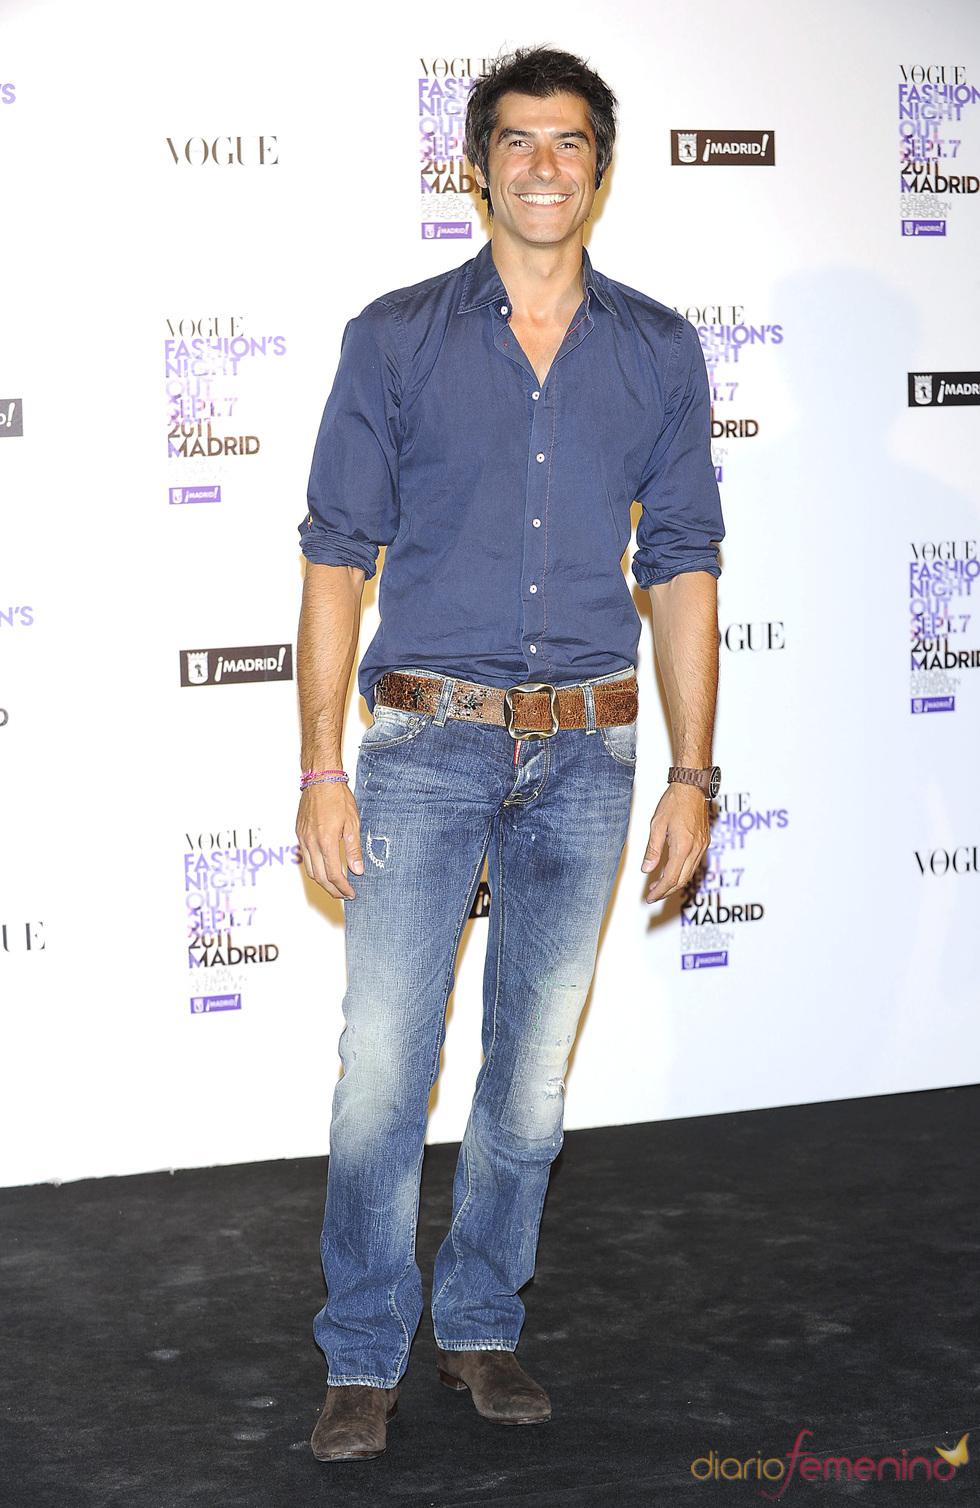 Jorge fern ndez durante la vogue fashion night out madrid 2011 - Banos jorge fernandez ...